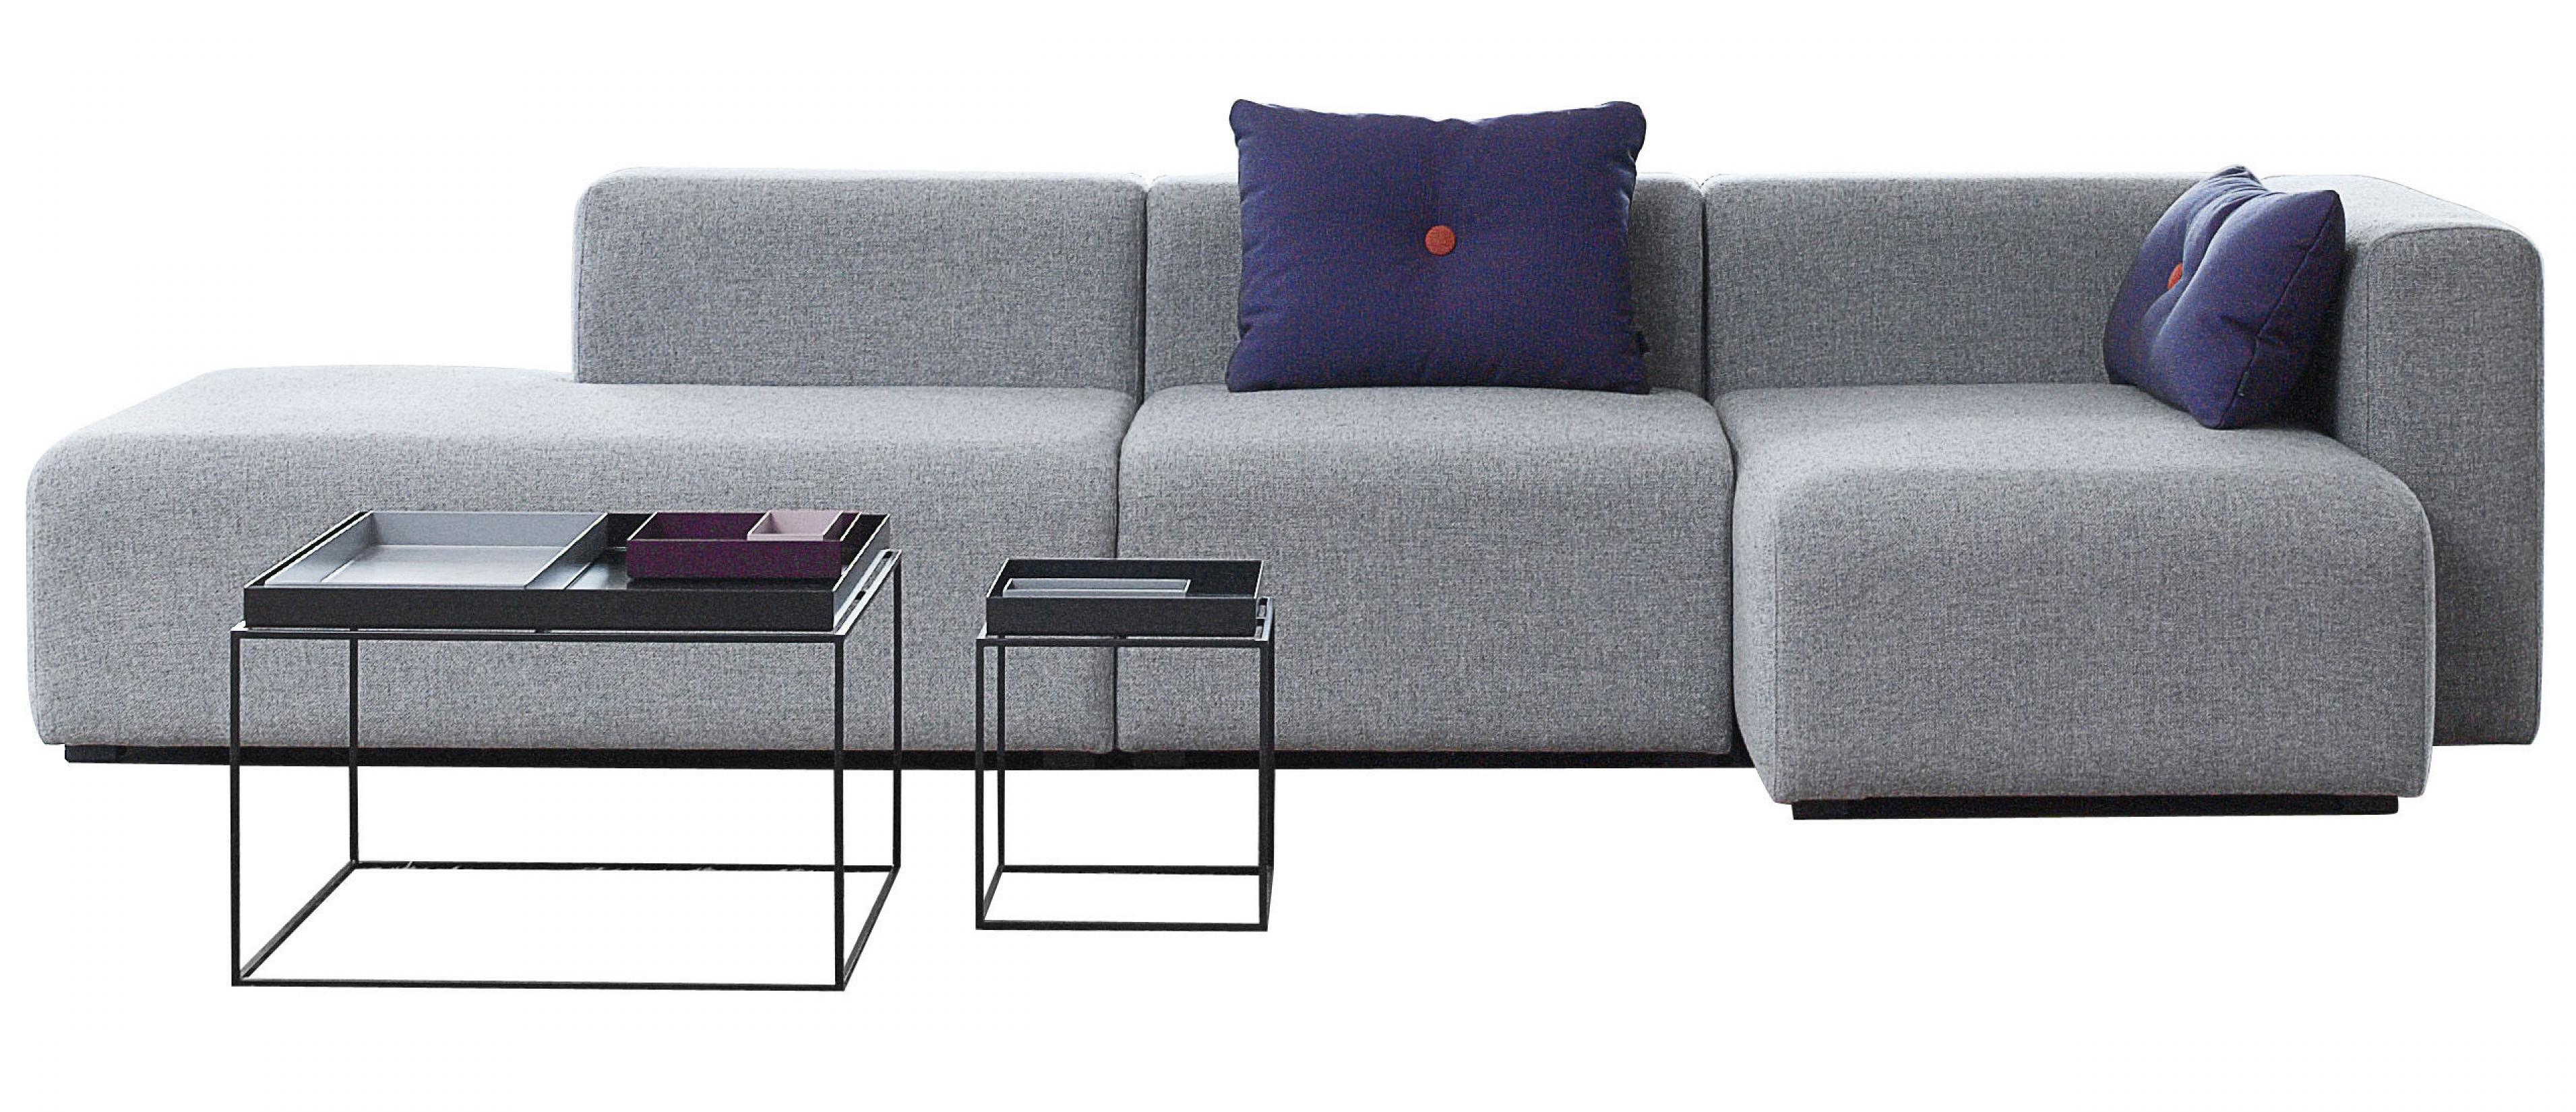 photos canap hay mags. Black Bedroom Furniture Sets. Home Design Ideas